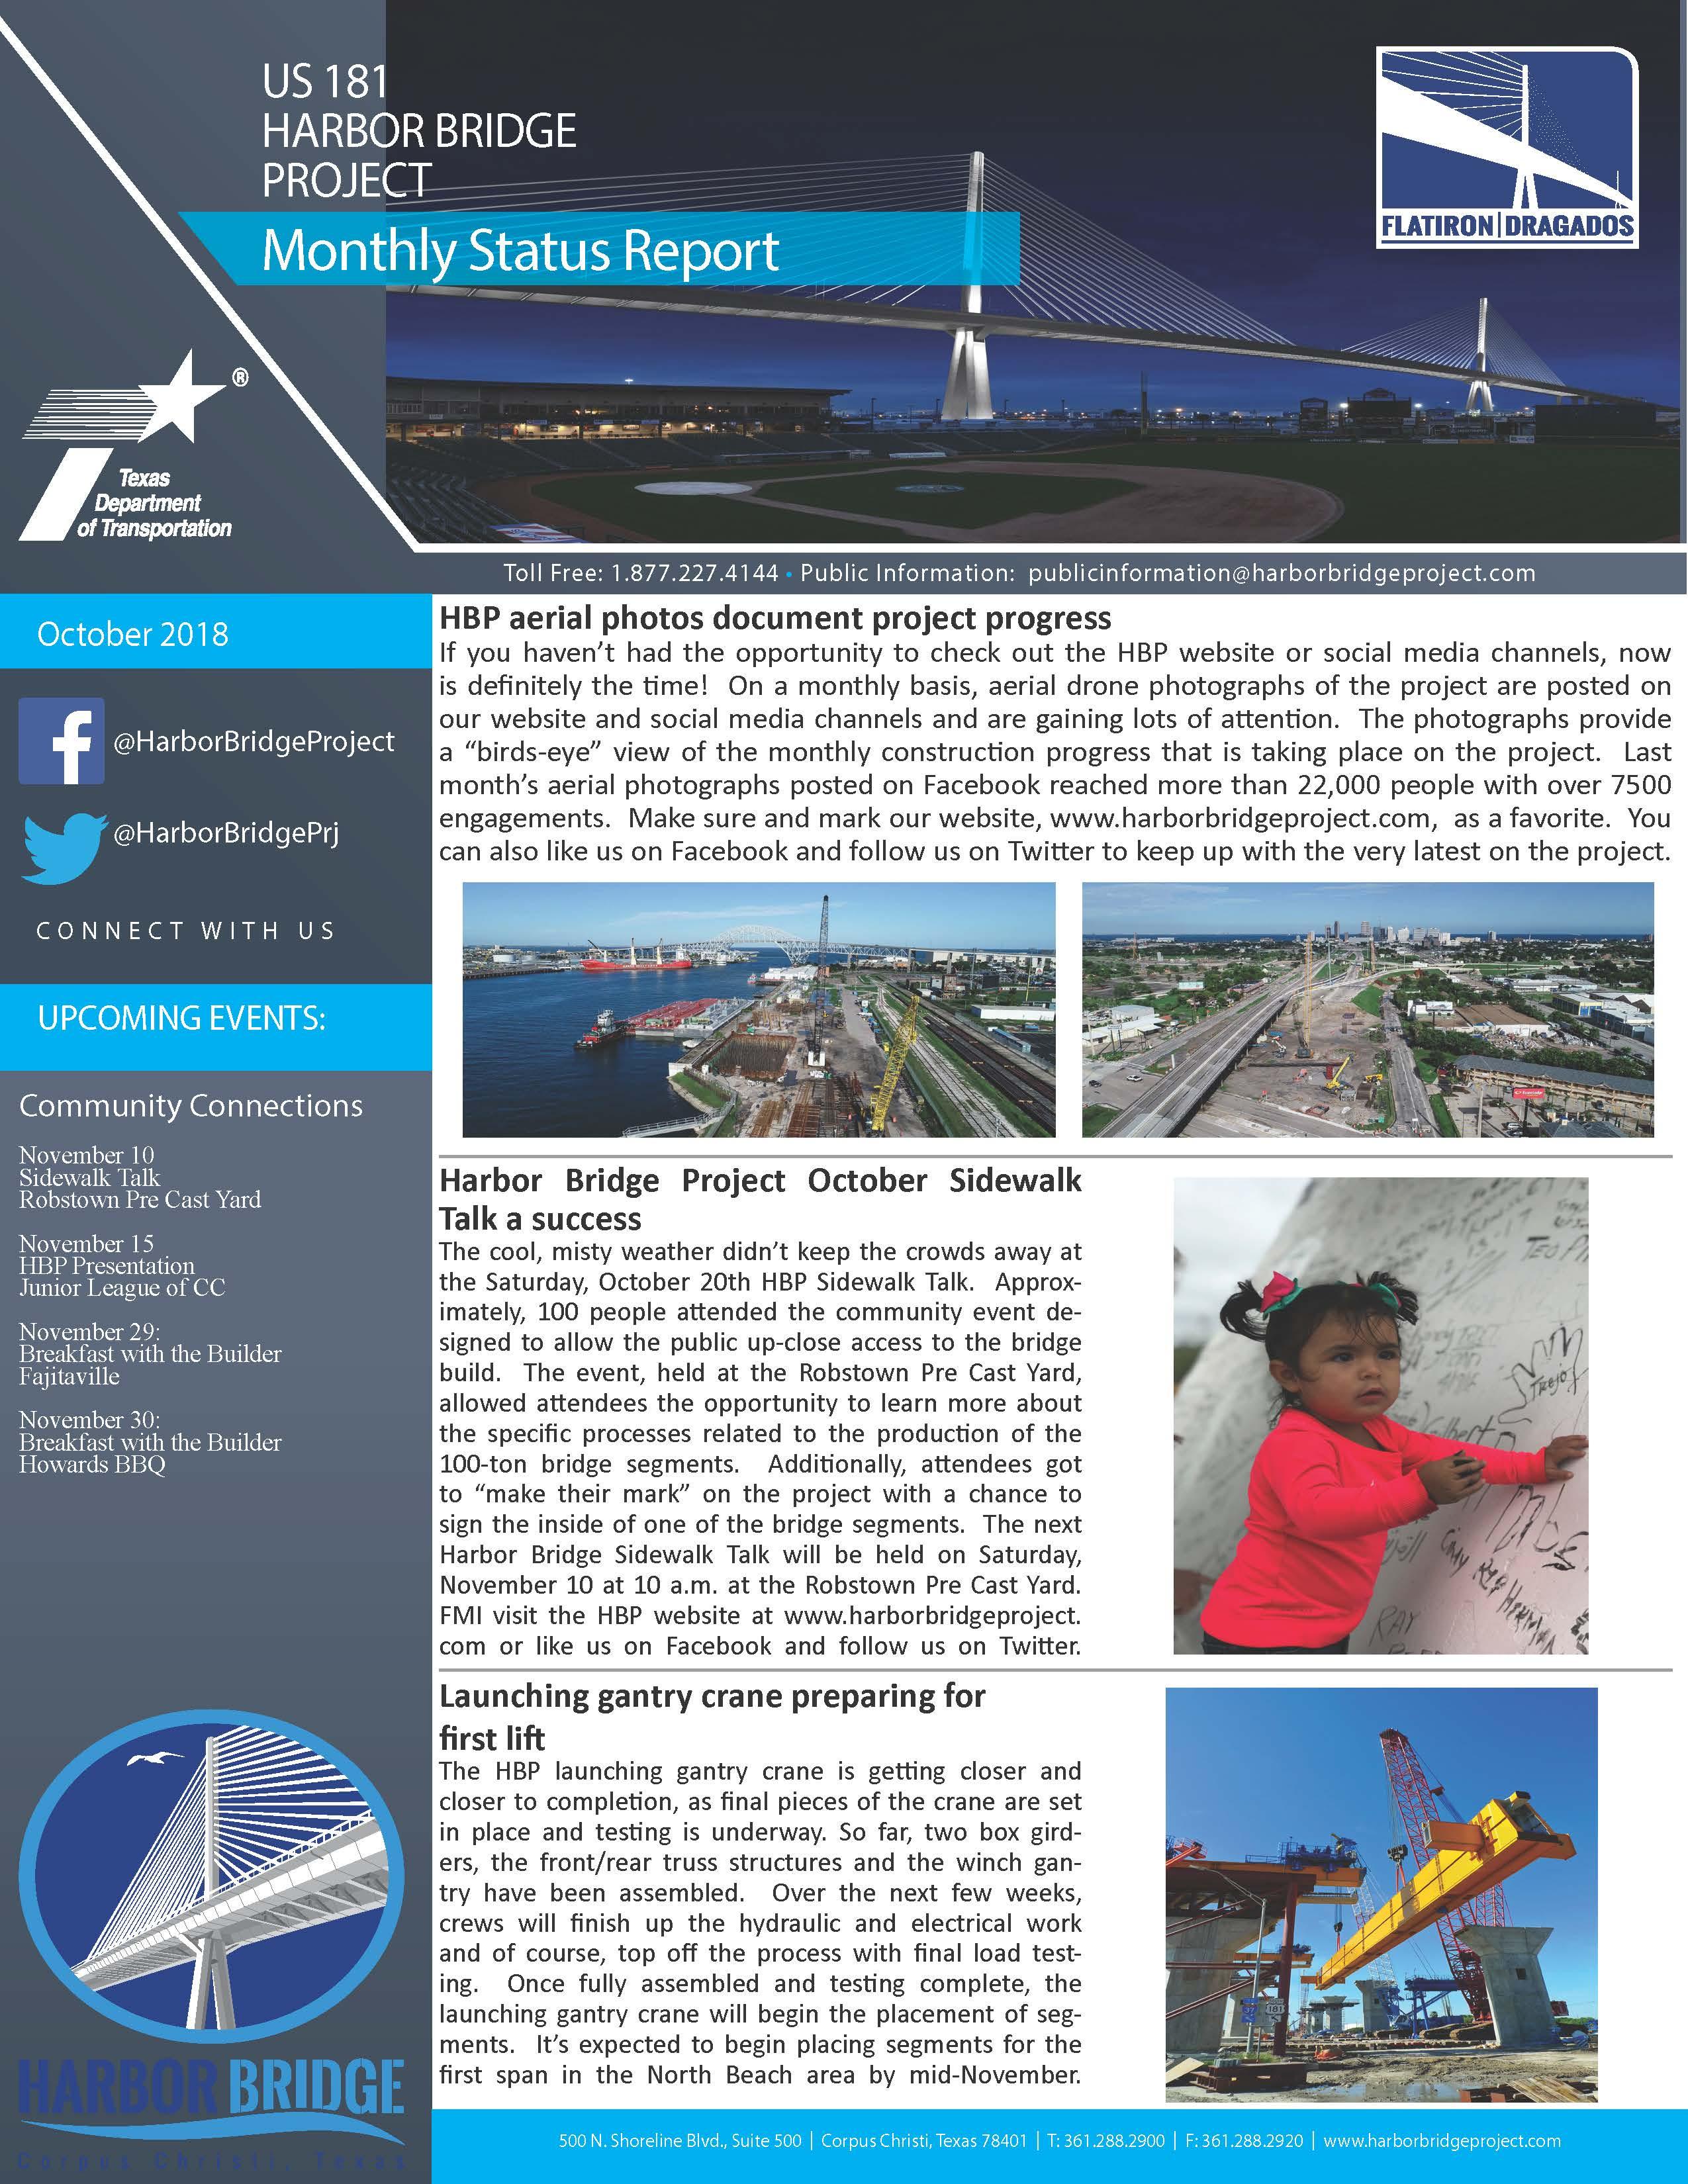 October 2018 Monthly Status Report